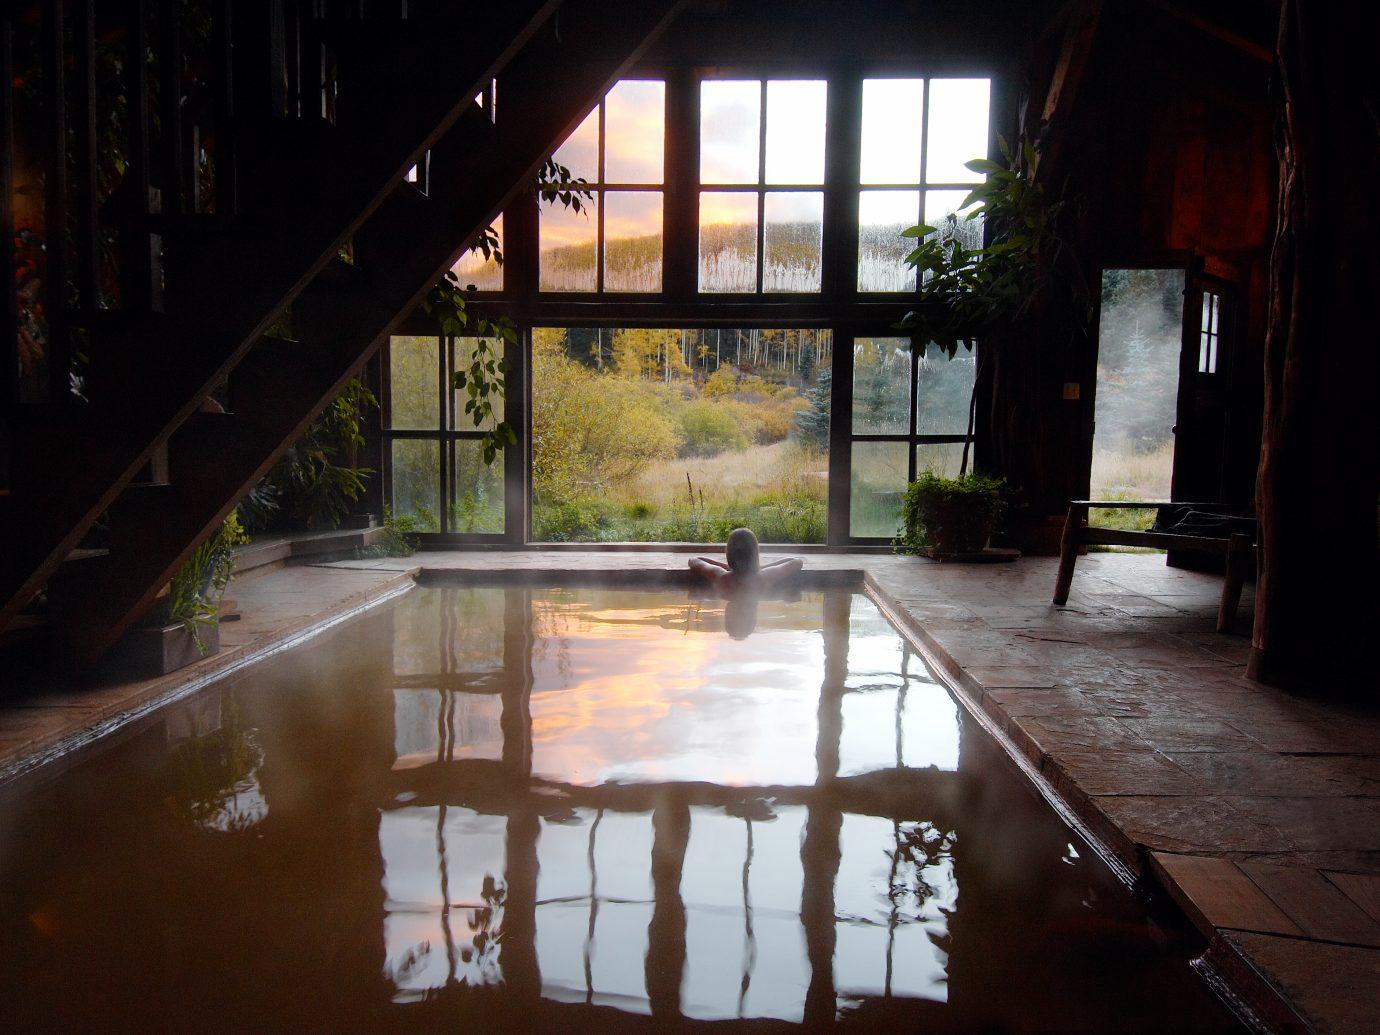 woman soaking in pool in bathhouse interior